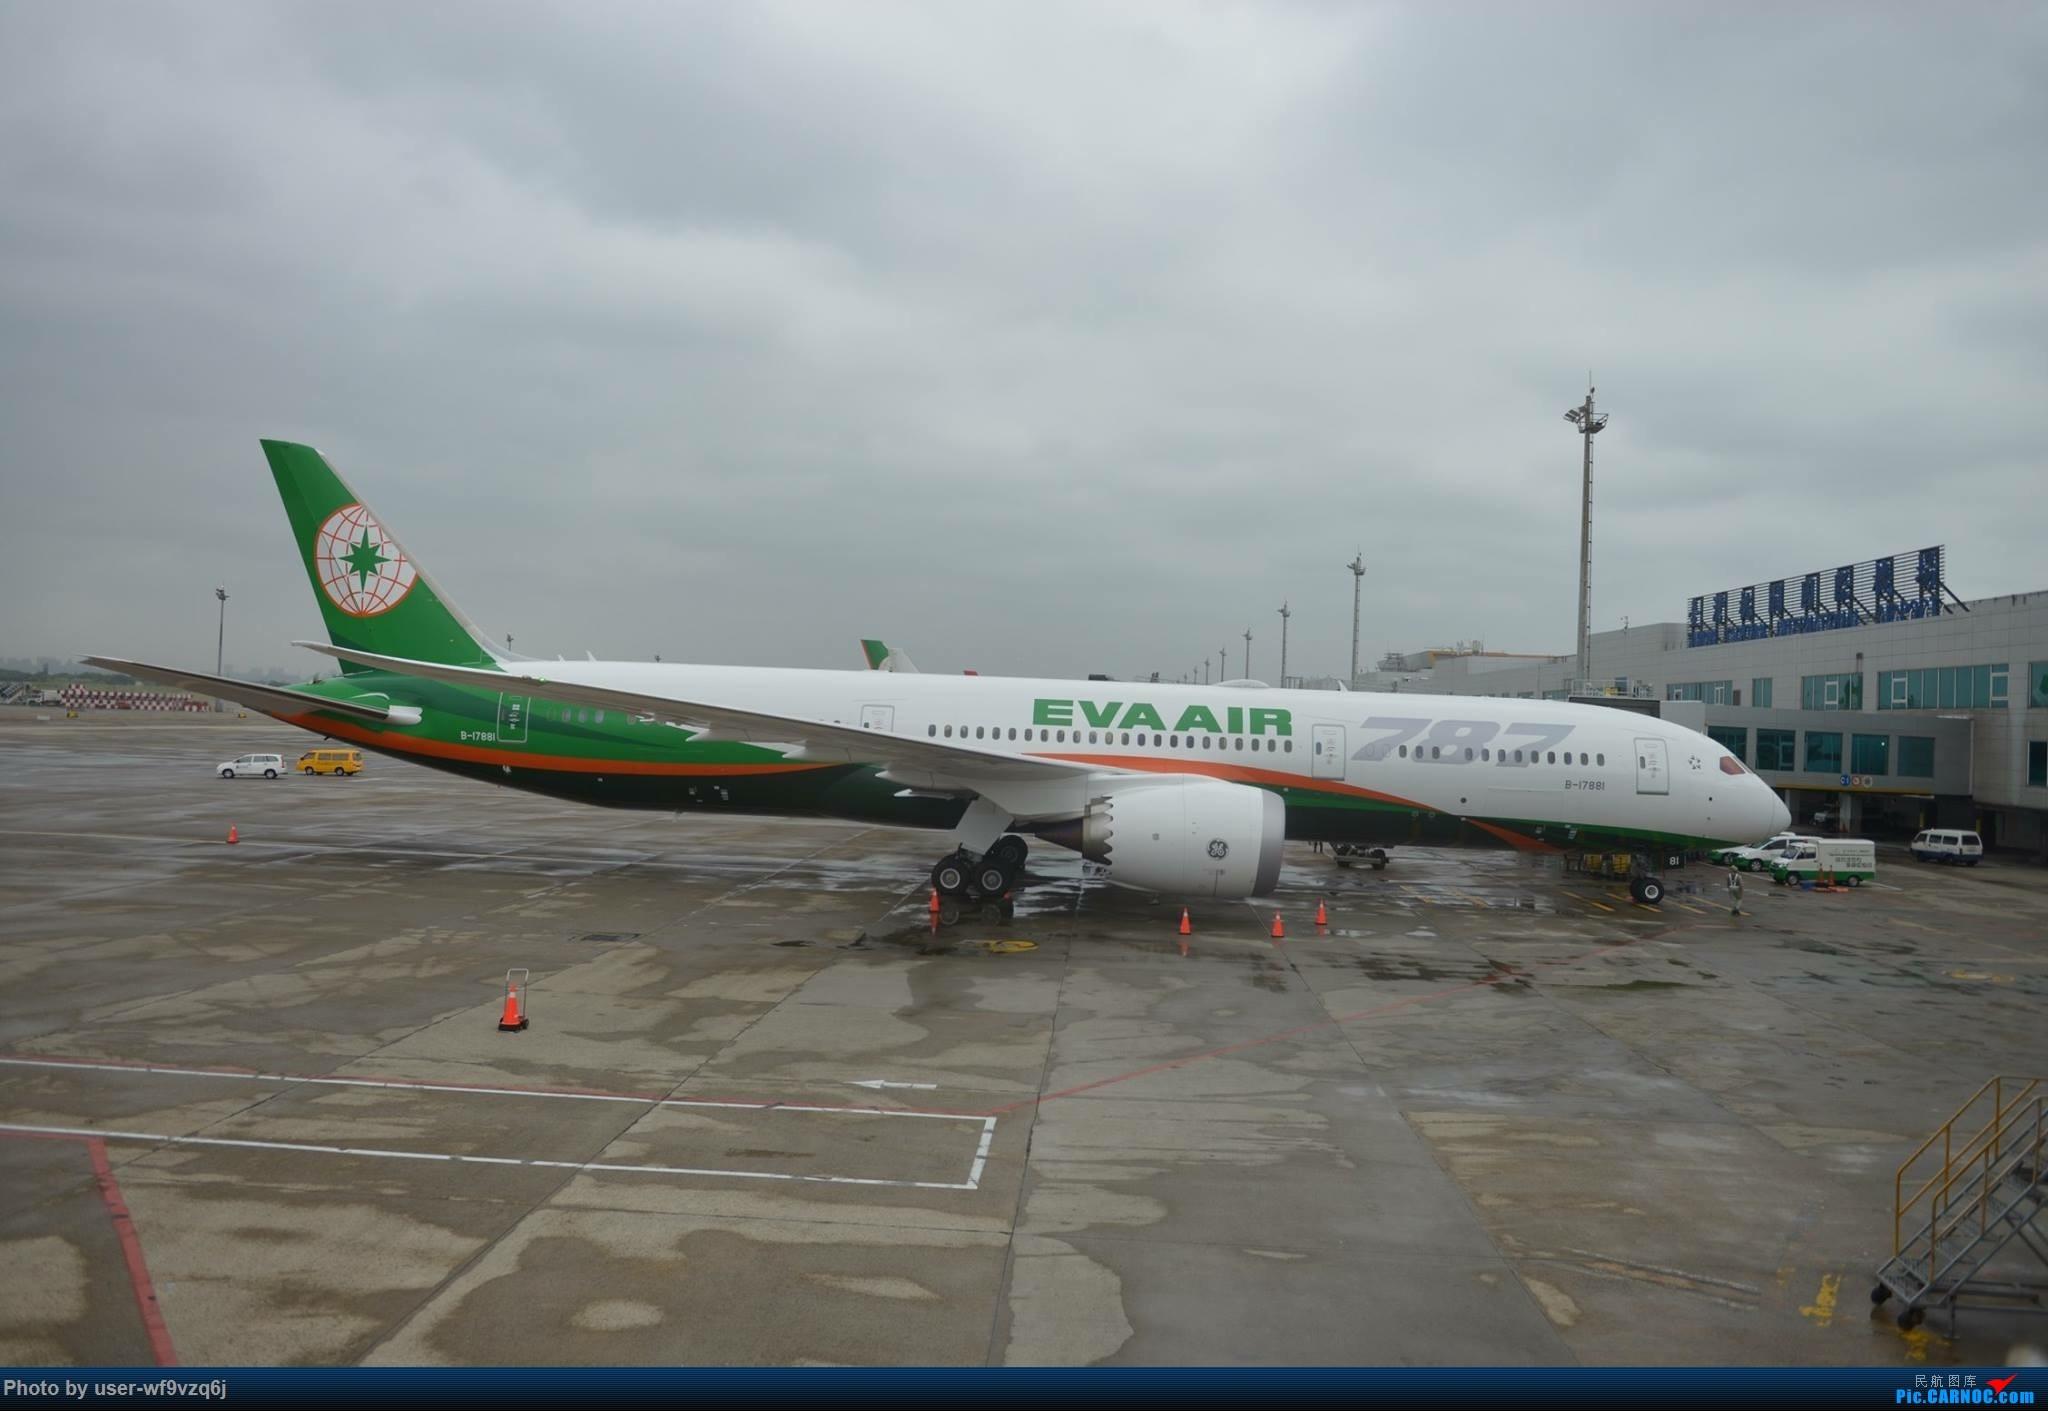 Re:长荣航空 EVA AIR Boeing 787-9 Dreamliner BOEING 787-9 B-17881 中国台北桃园国际机场